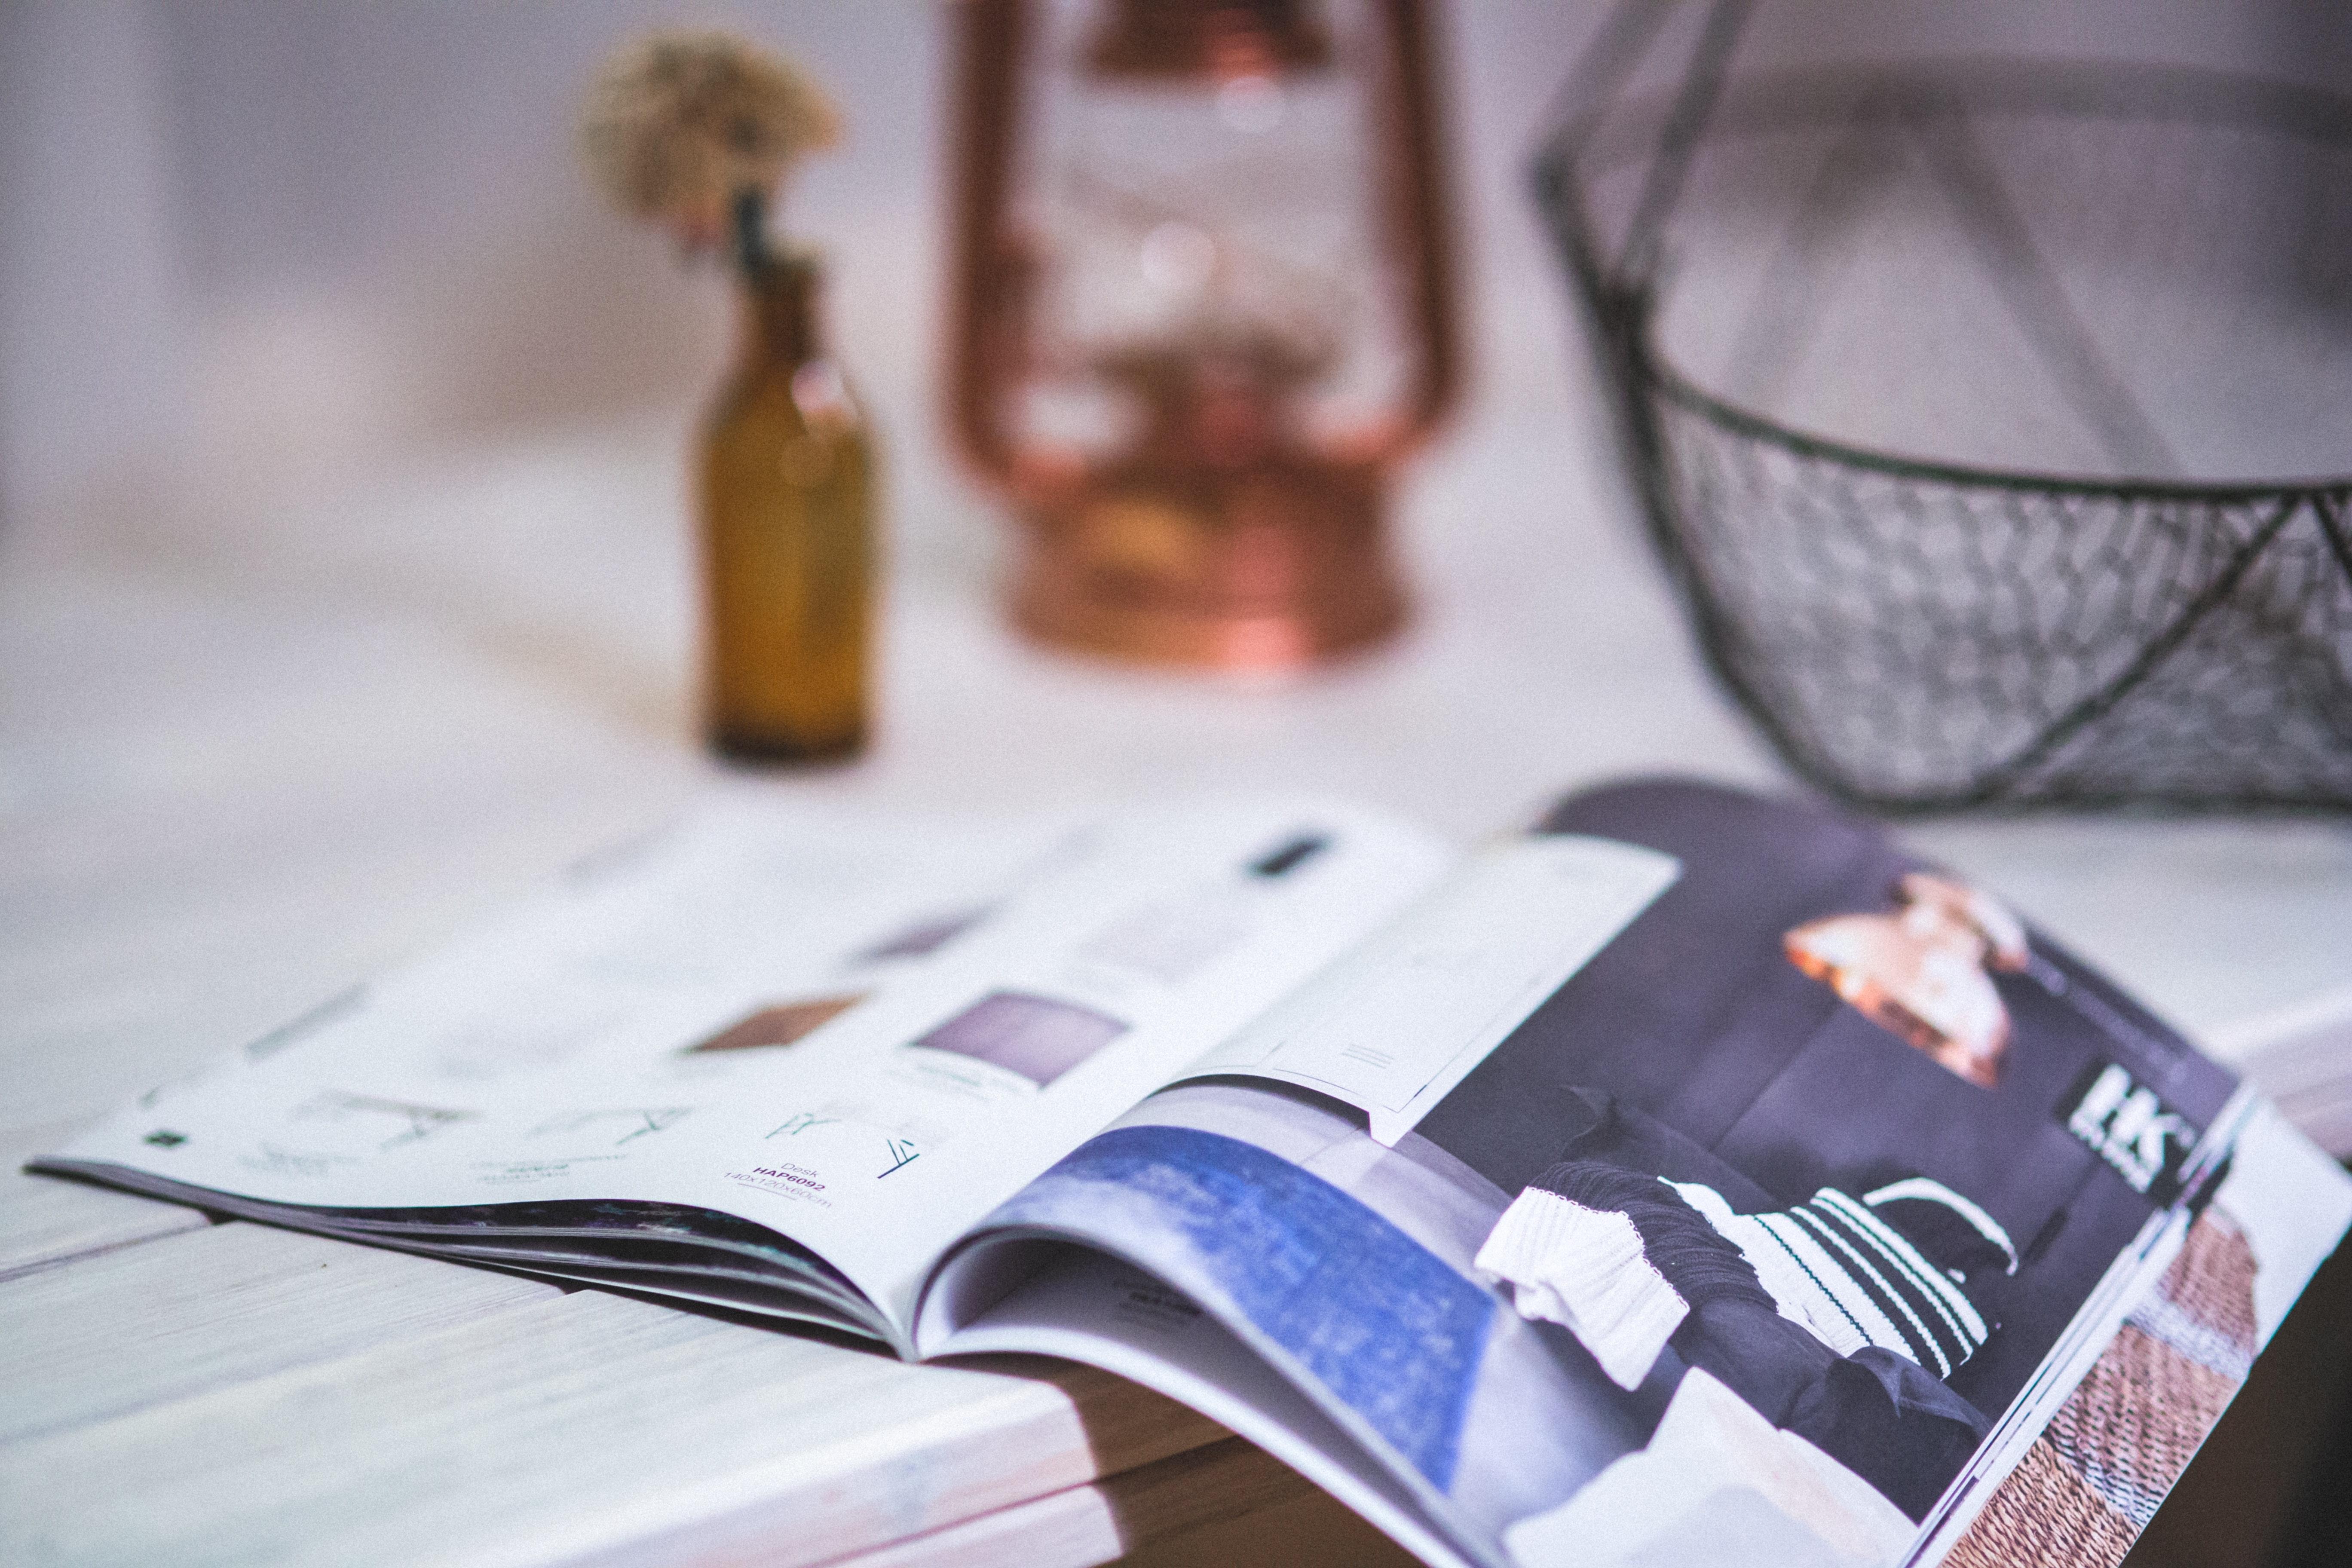 Detail of open magazine photo